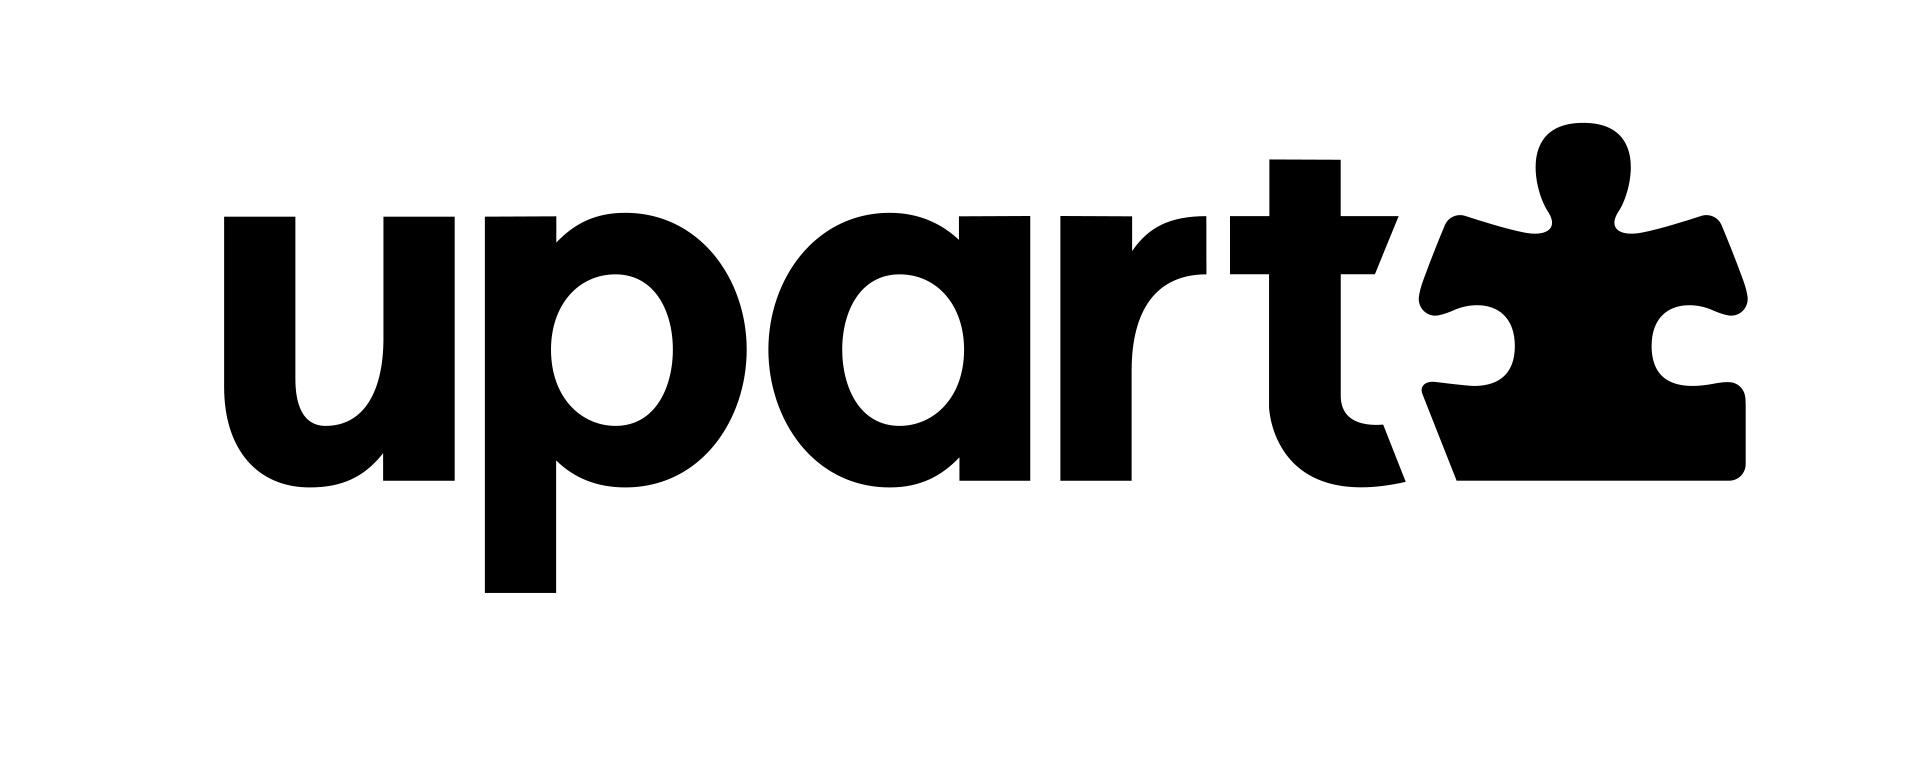 upart Werbung & Kommunikation GmbH